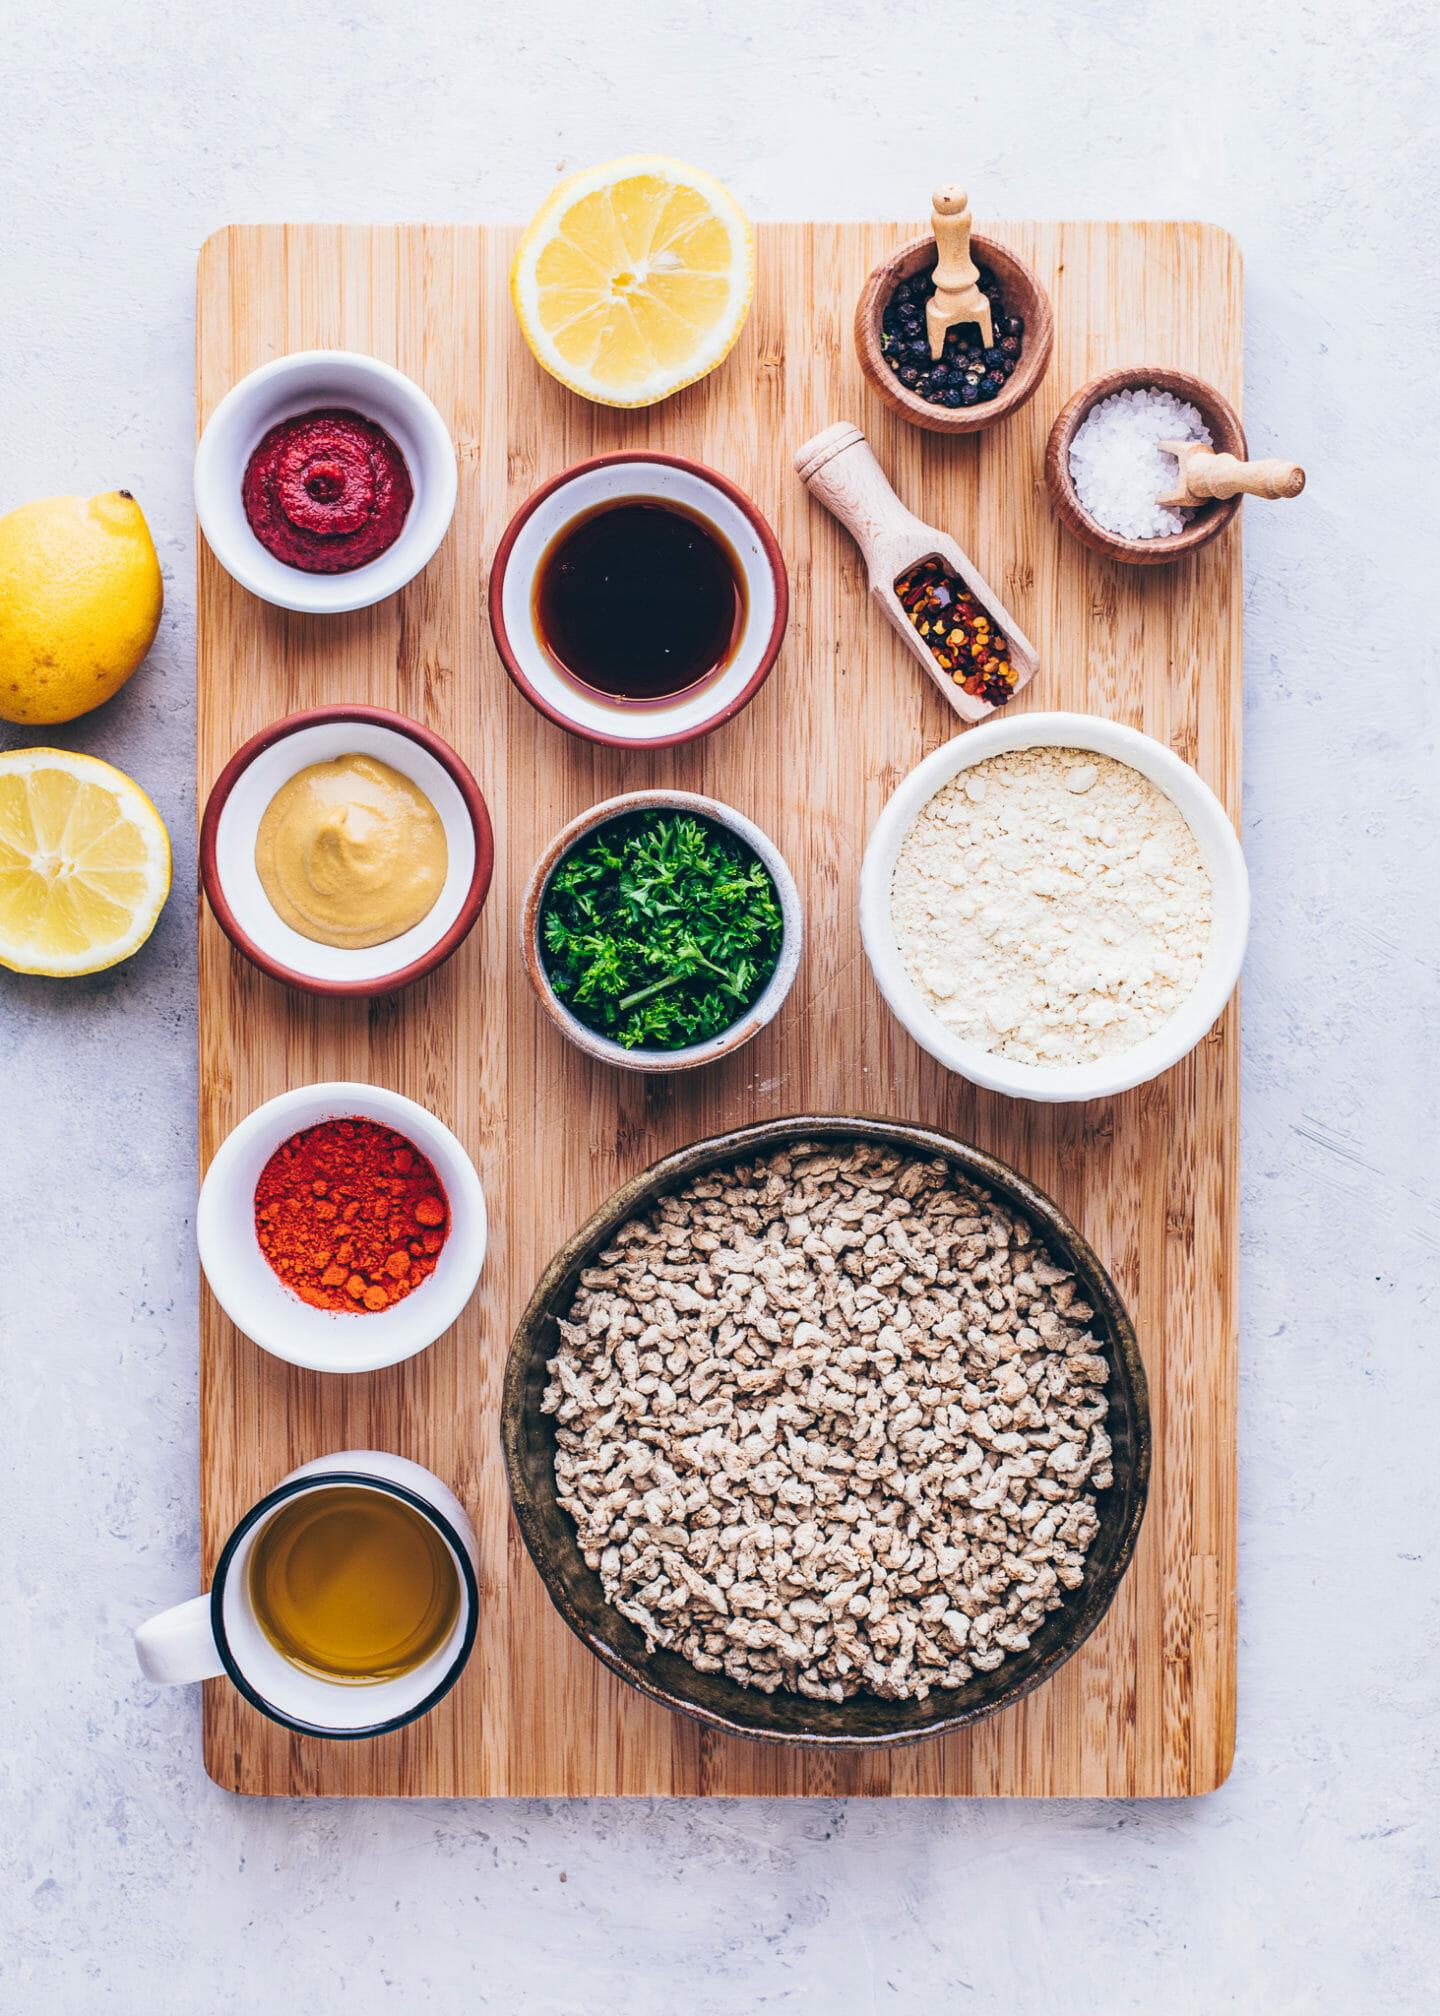 Ingredients for vegan cevapcici